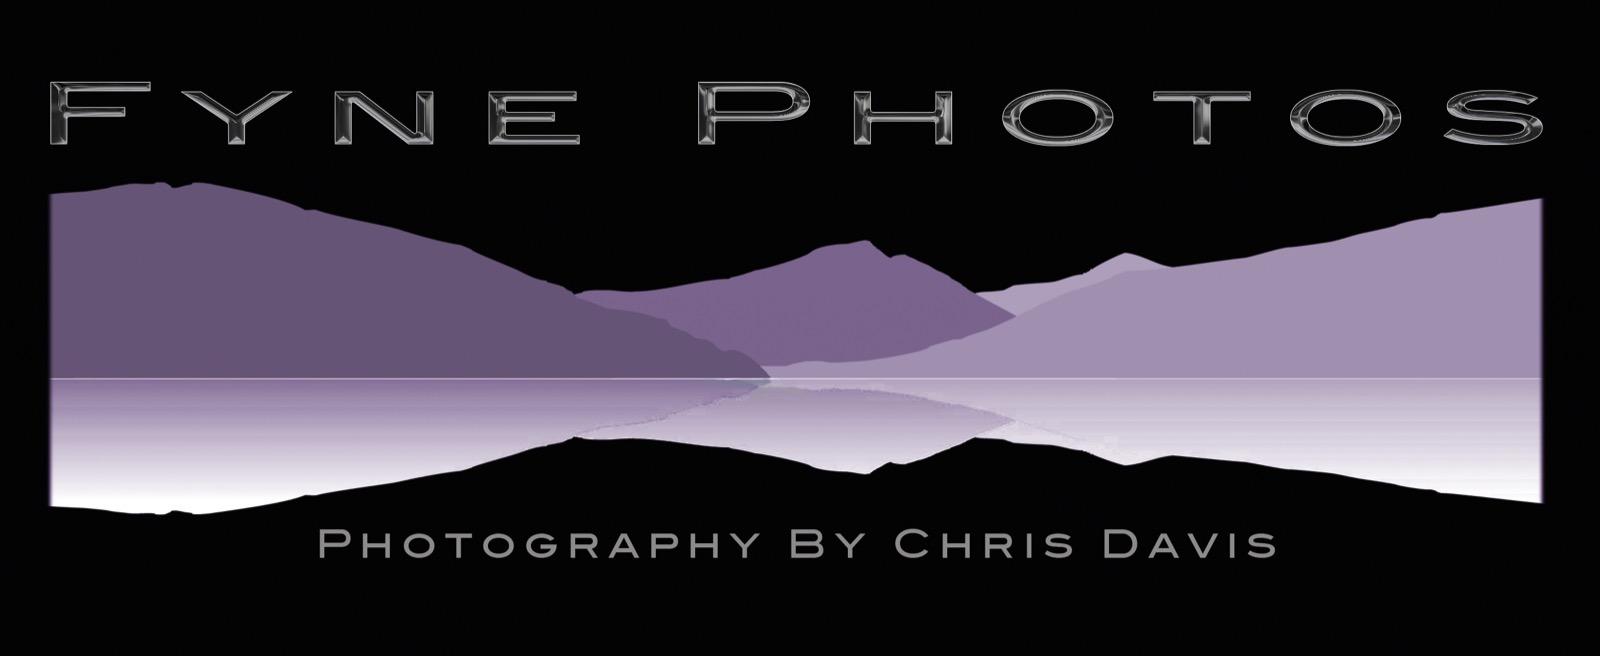 Chris Davis Photography